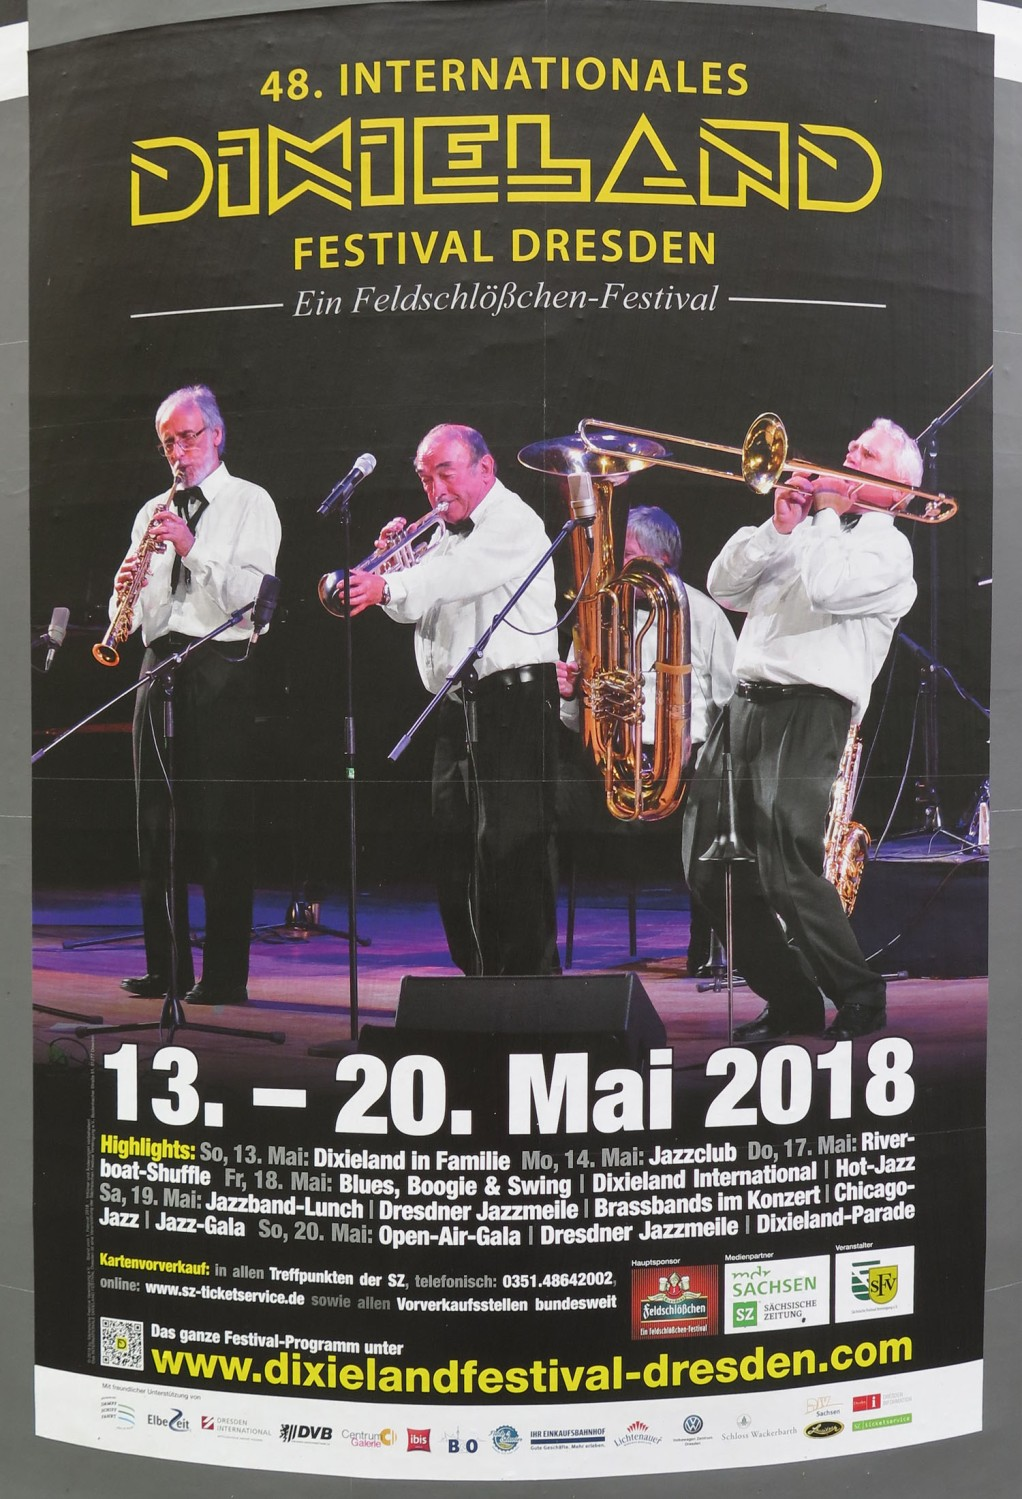 germany-dresden-dixieland-jazz-festival-poster